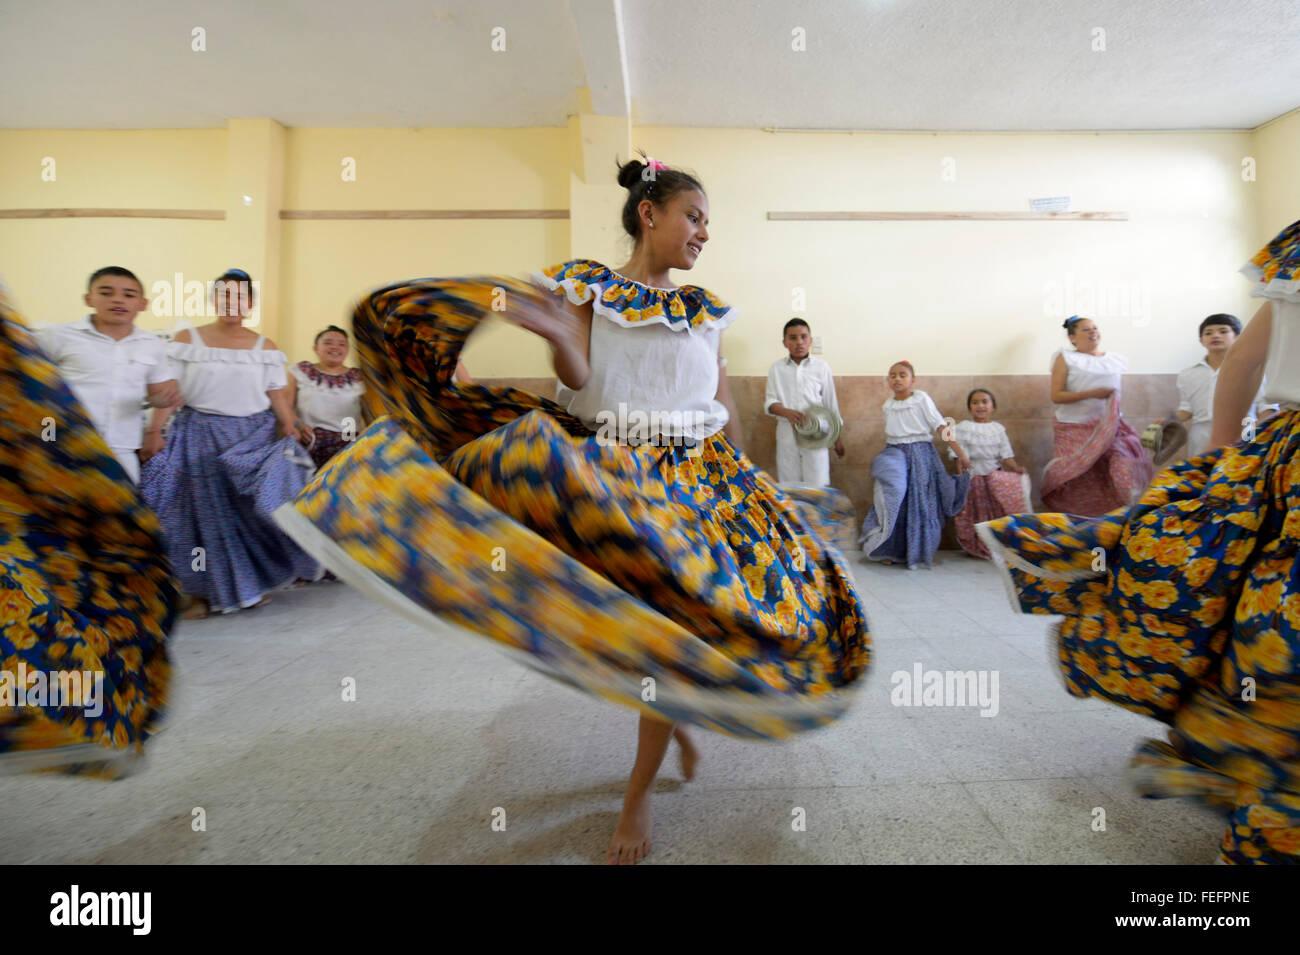 Jupe fille danser, voler, groupe de danse, danse folklorique, danse traditionnelle, Barrio San Martín, Bogotá, Photo Stock